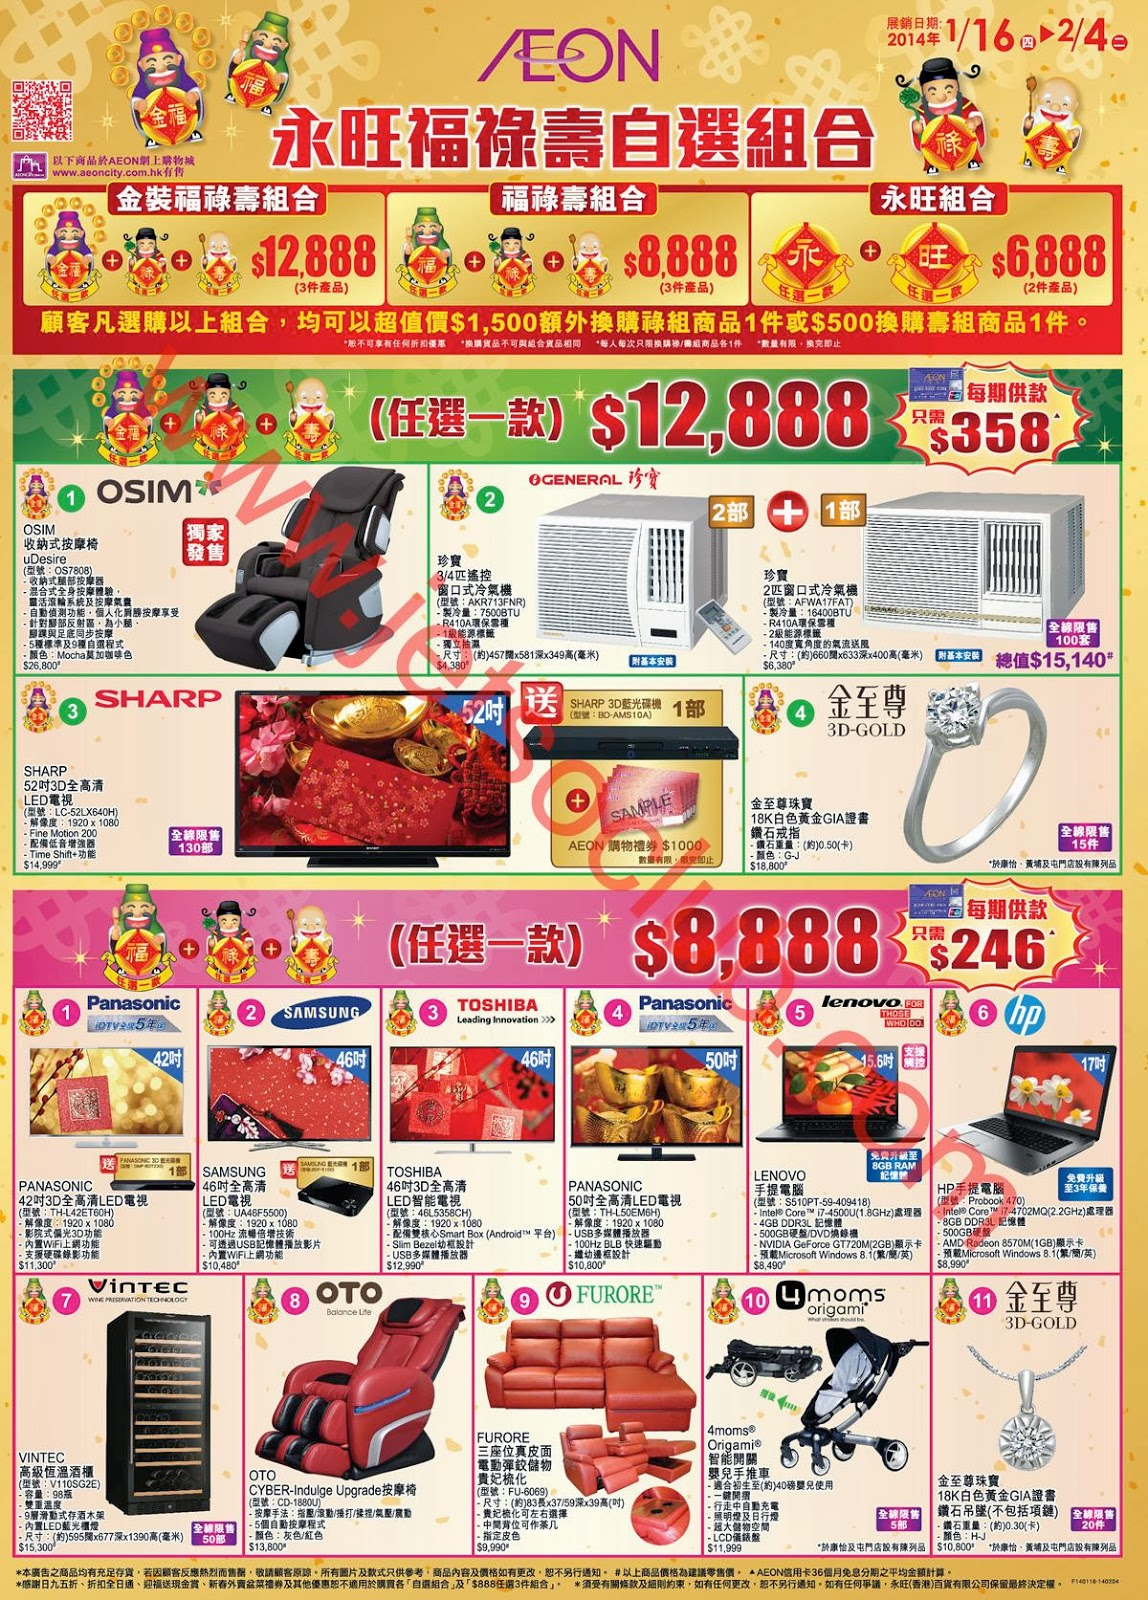 AEON:永旺福祿壽自選組合(16/1-4/2) ( Jetso Club 著數俱樂部 )